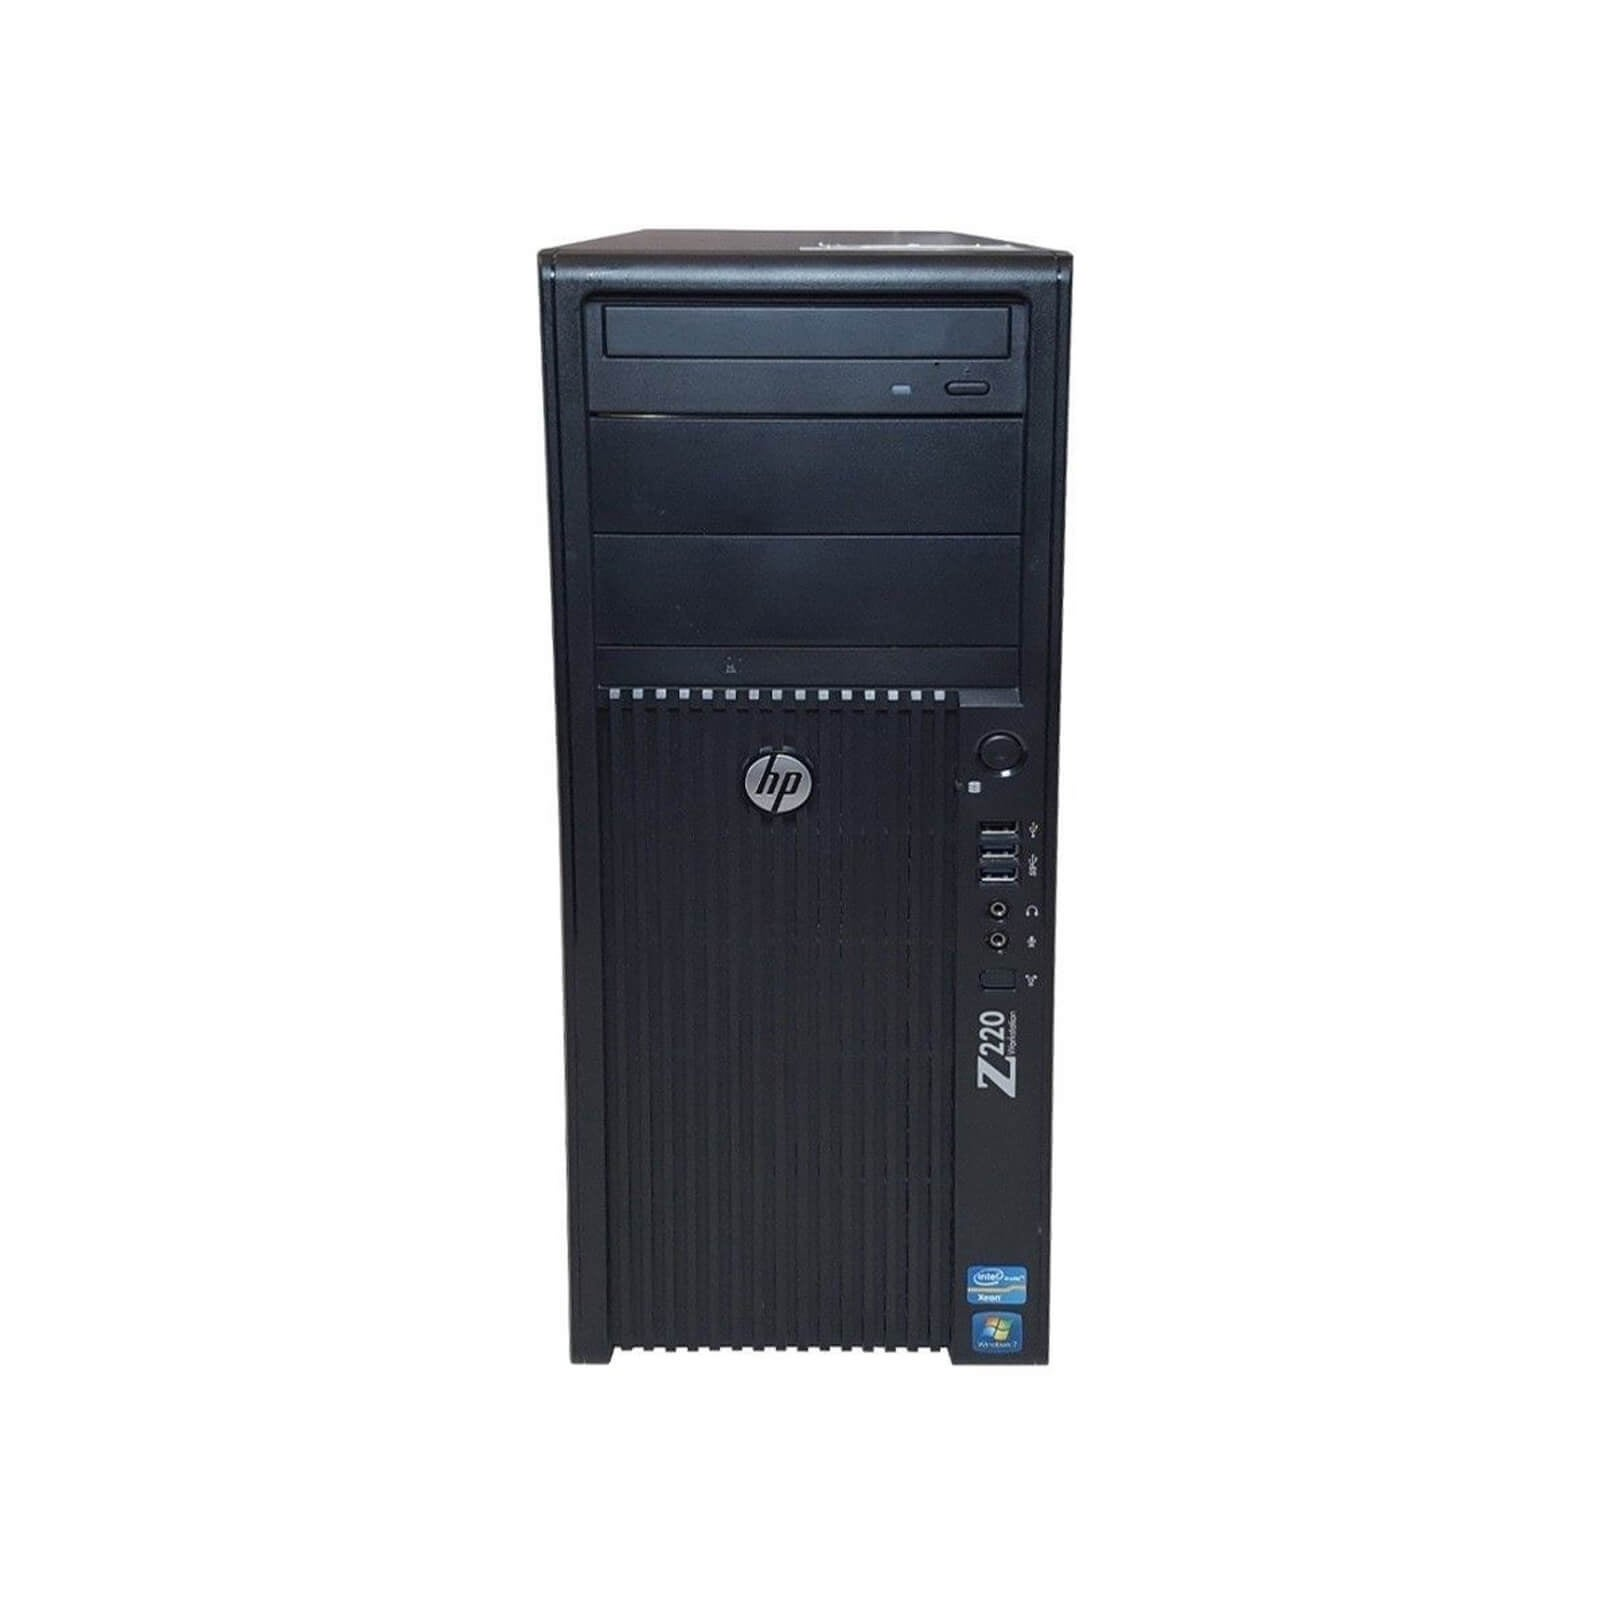 HP Z220 Workstation CMT Refurbished PC - Intel Core i5 3470 3rd Gen 3 2 GHz  8GB 2TB HDD DVD-RW Windows 10 Pro 64-Bit